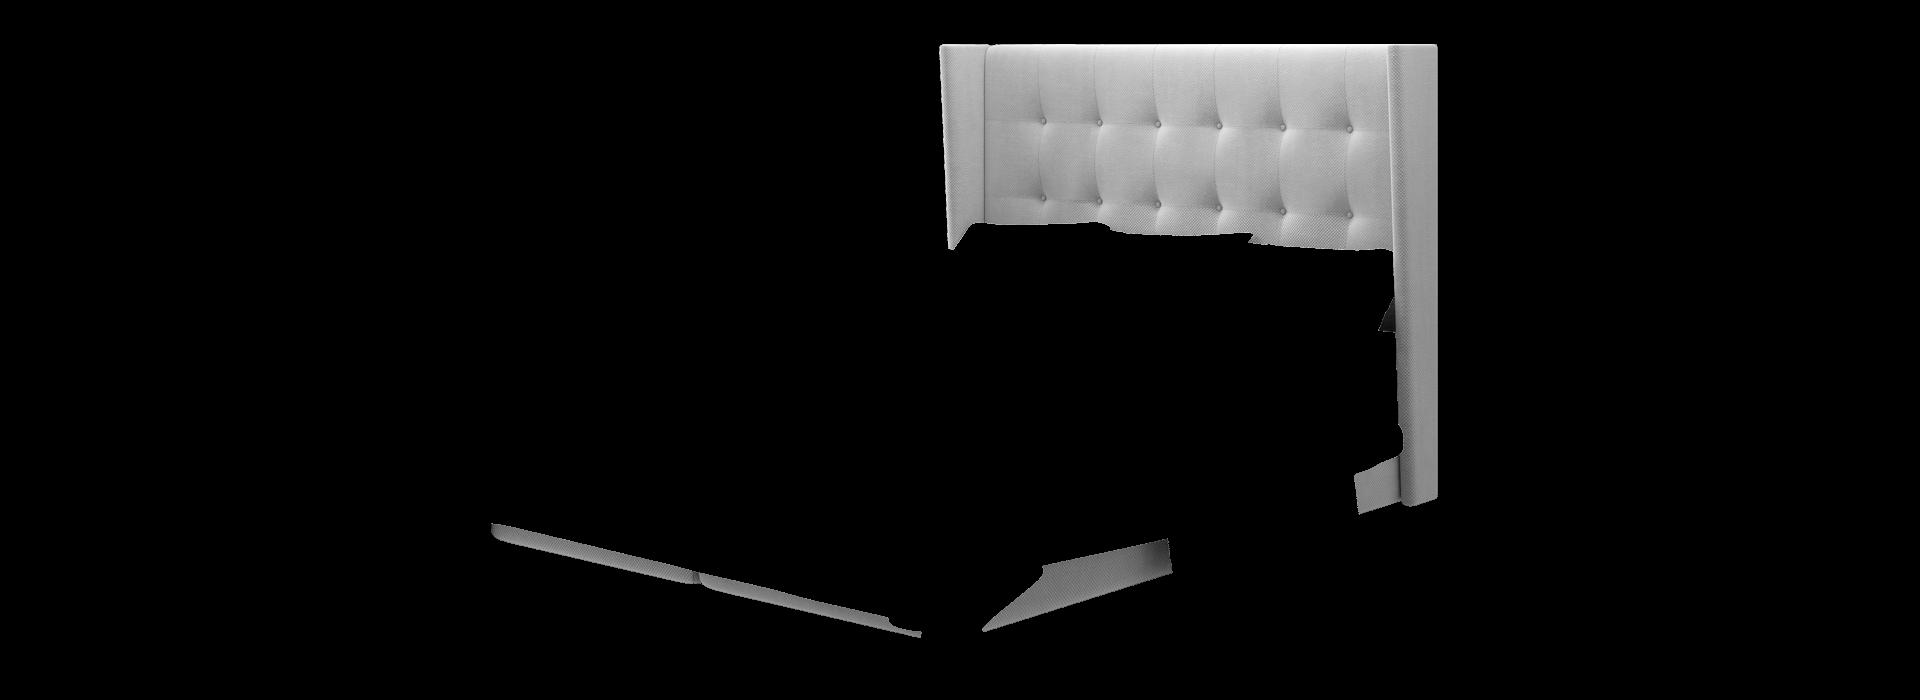 Грета 1.6 ліжко box spring - маска 4